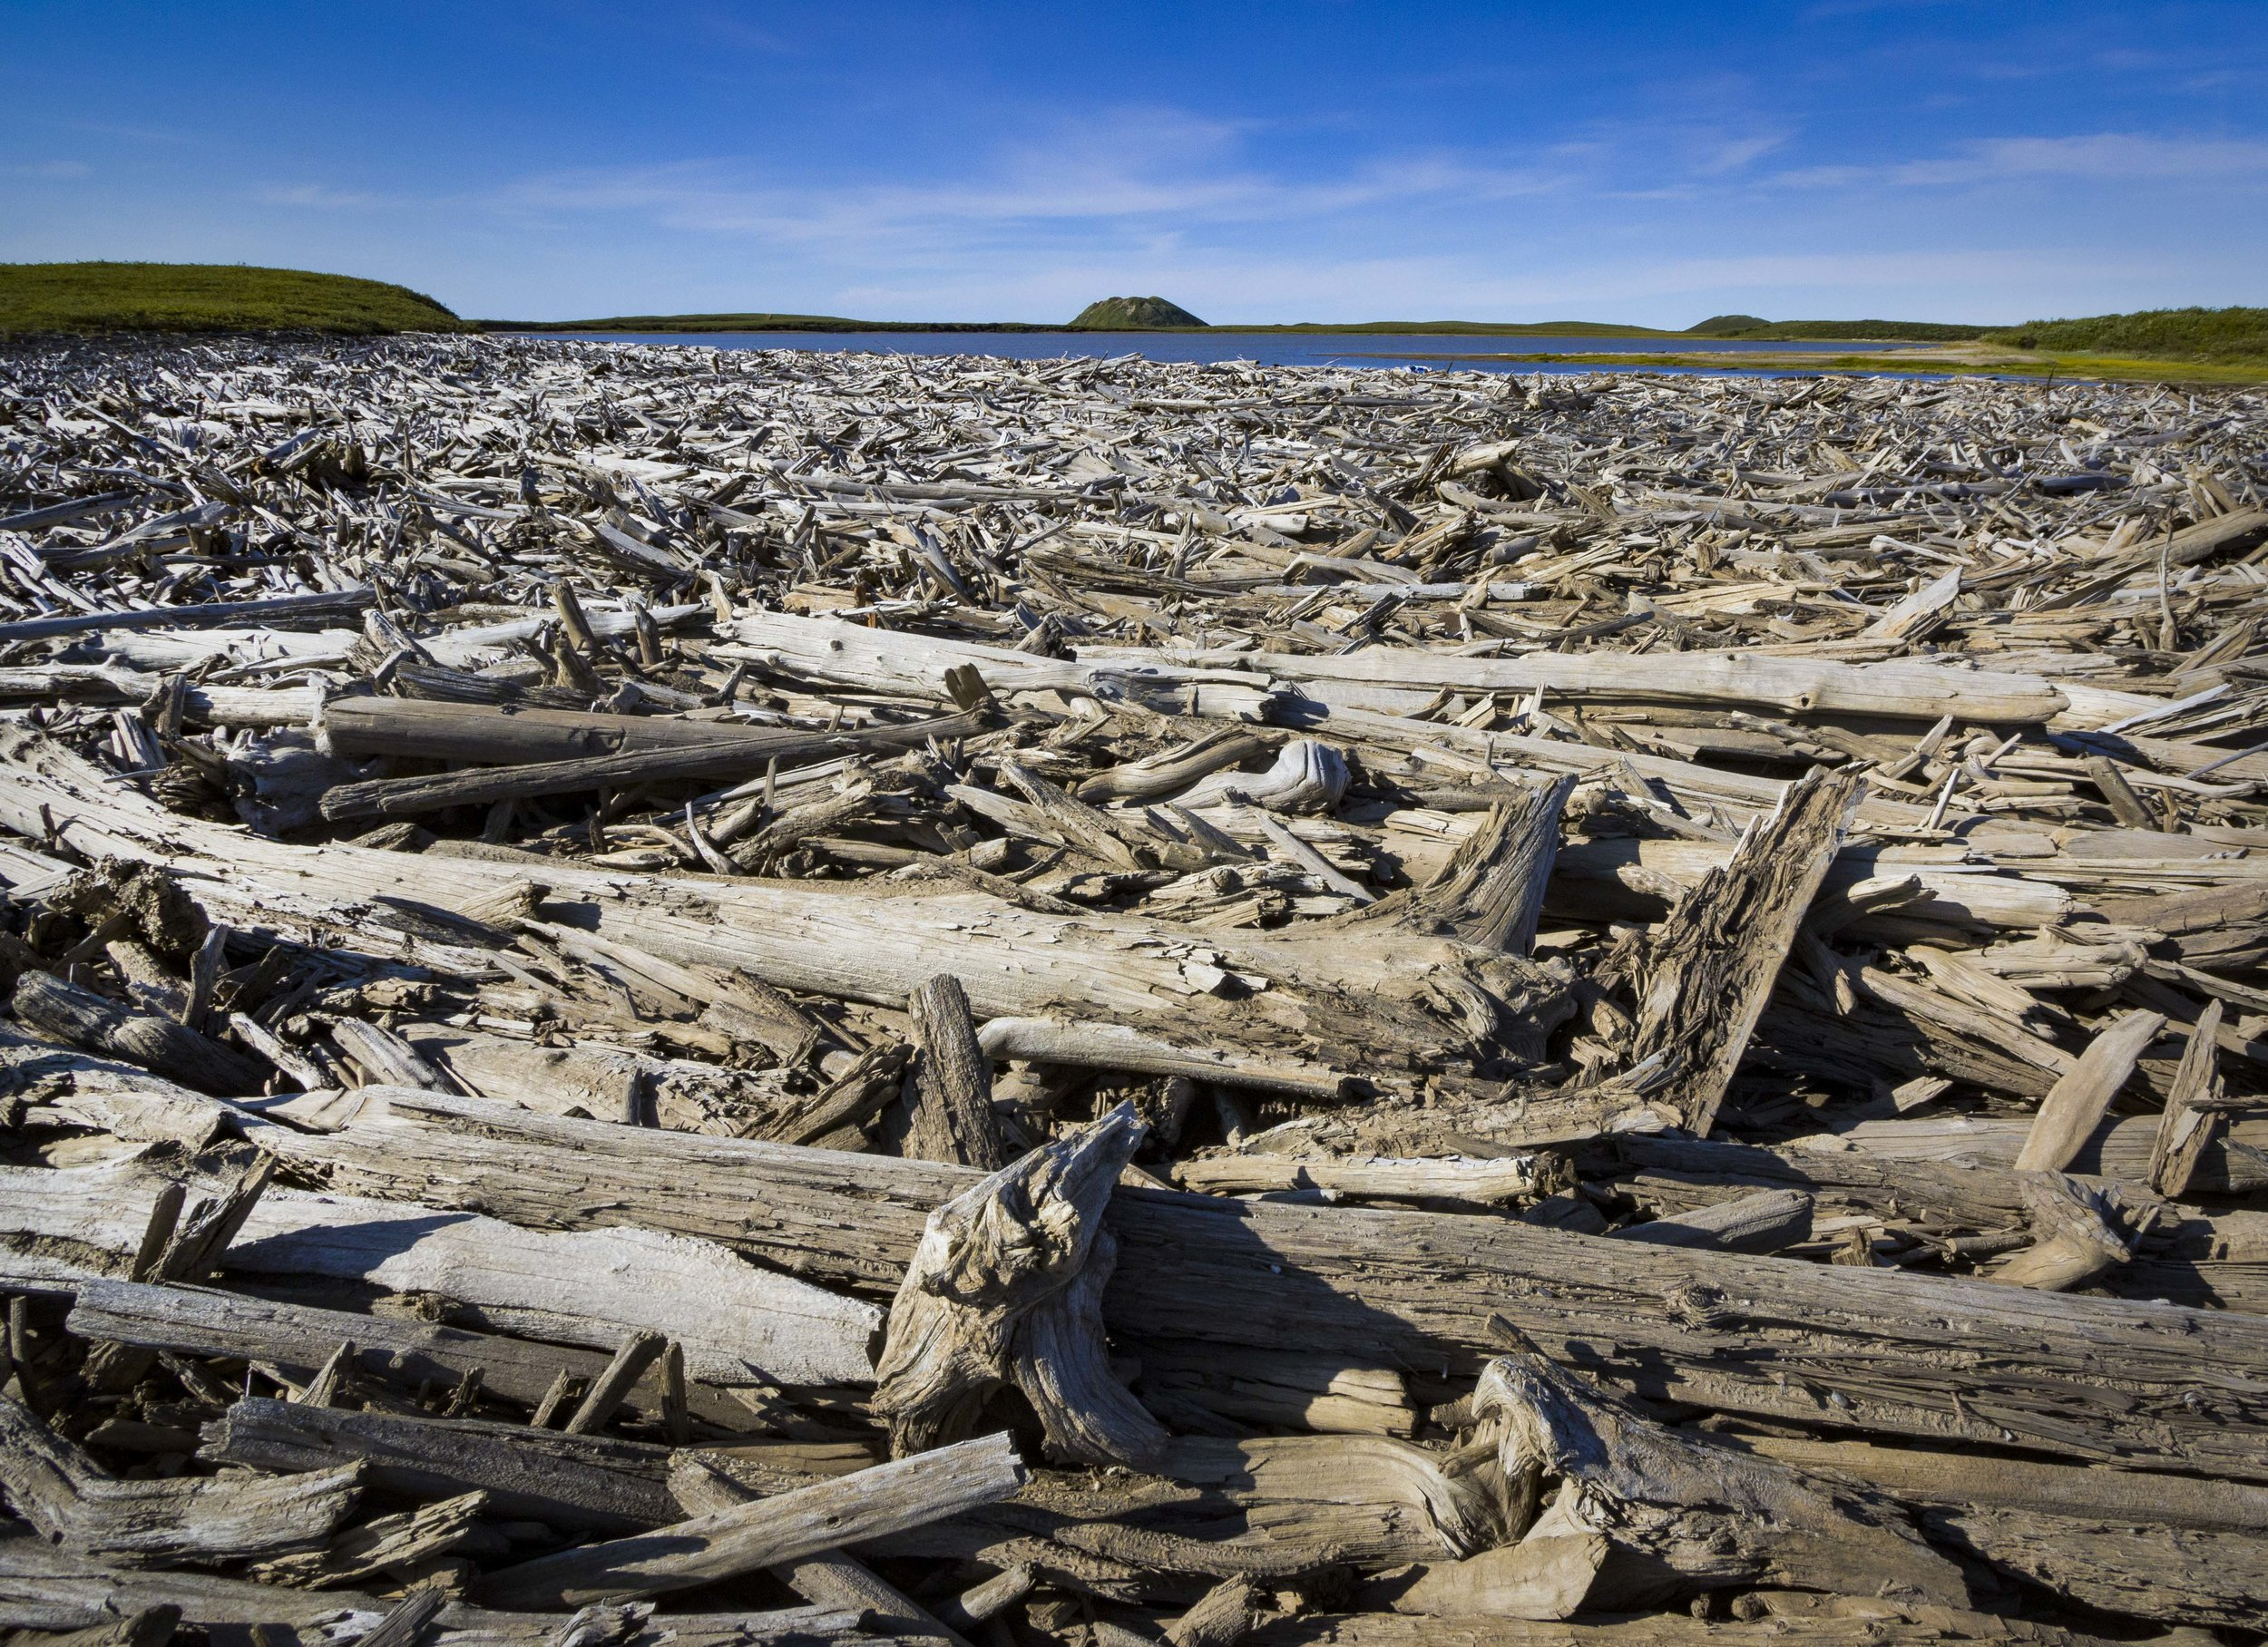 Dempster Highway, Roadtrip, Landscape, Arctic, rob gubiani, Tundra, Tombstone, Tuktoyuktuk, Inuvik, Dempster, Yukon, travel, wanderlust, log, logs, wood pile,